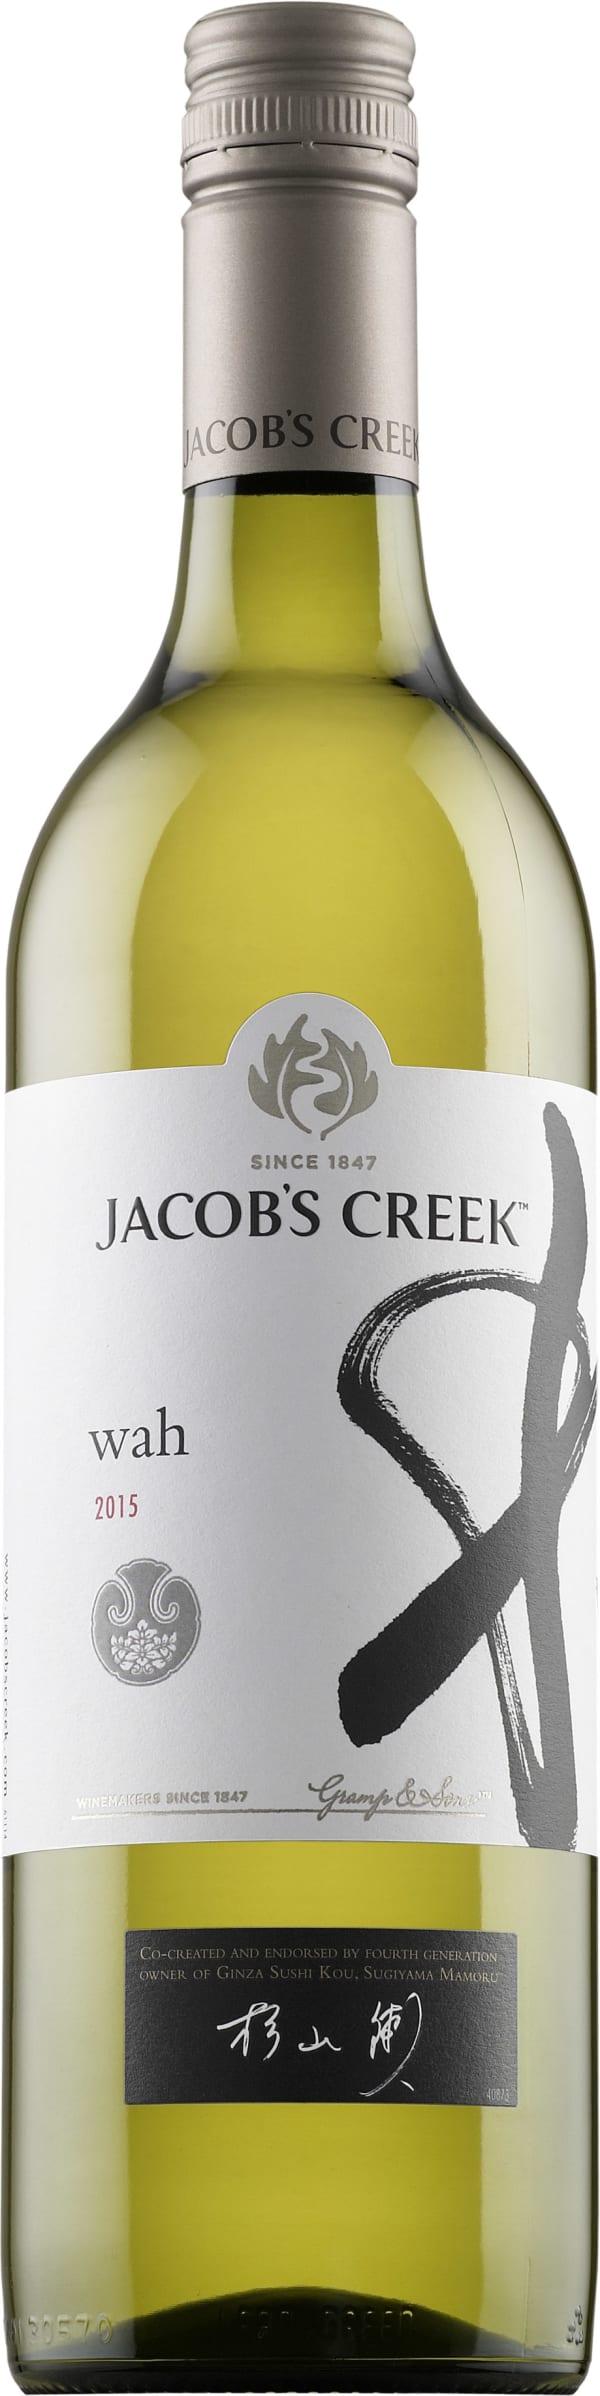 Jacob's Creek Wah 2016